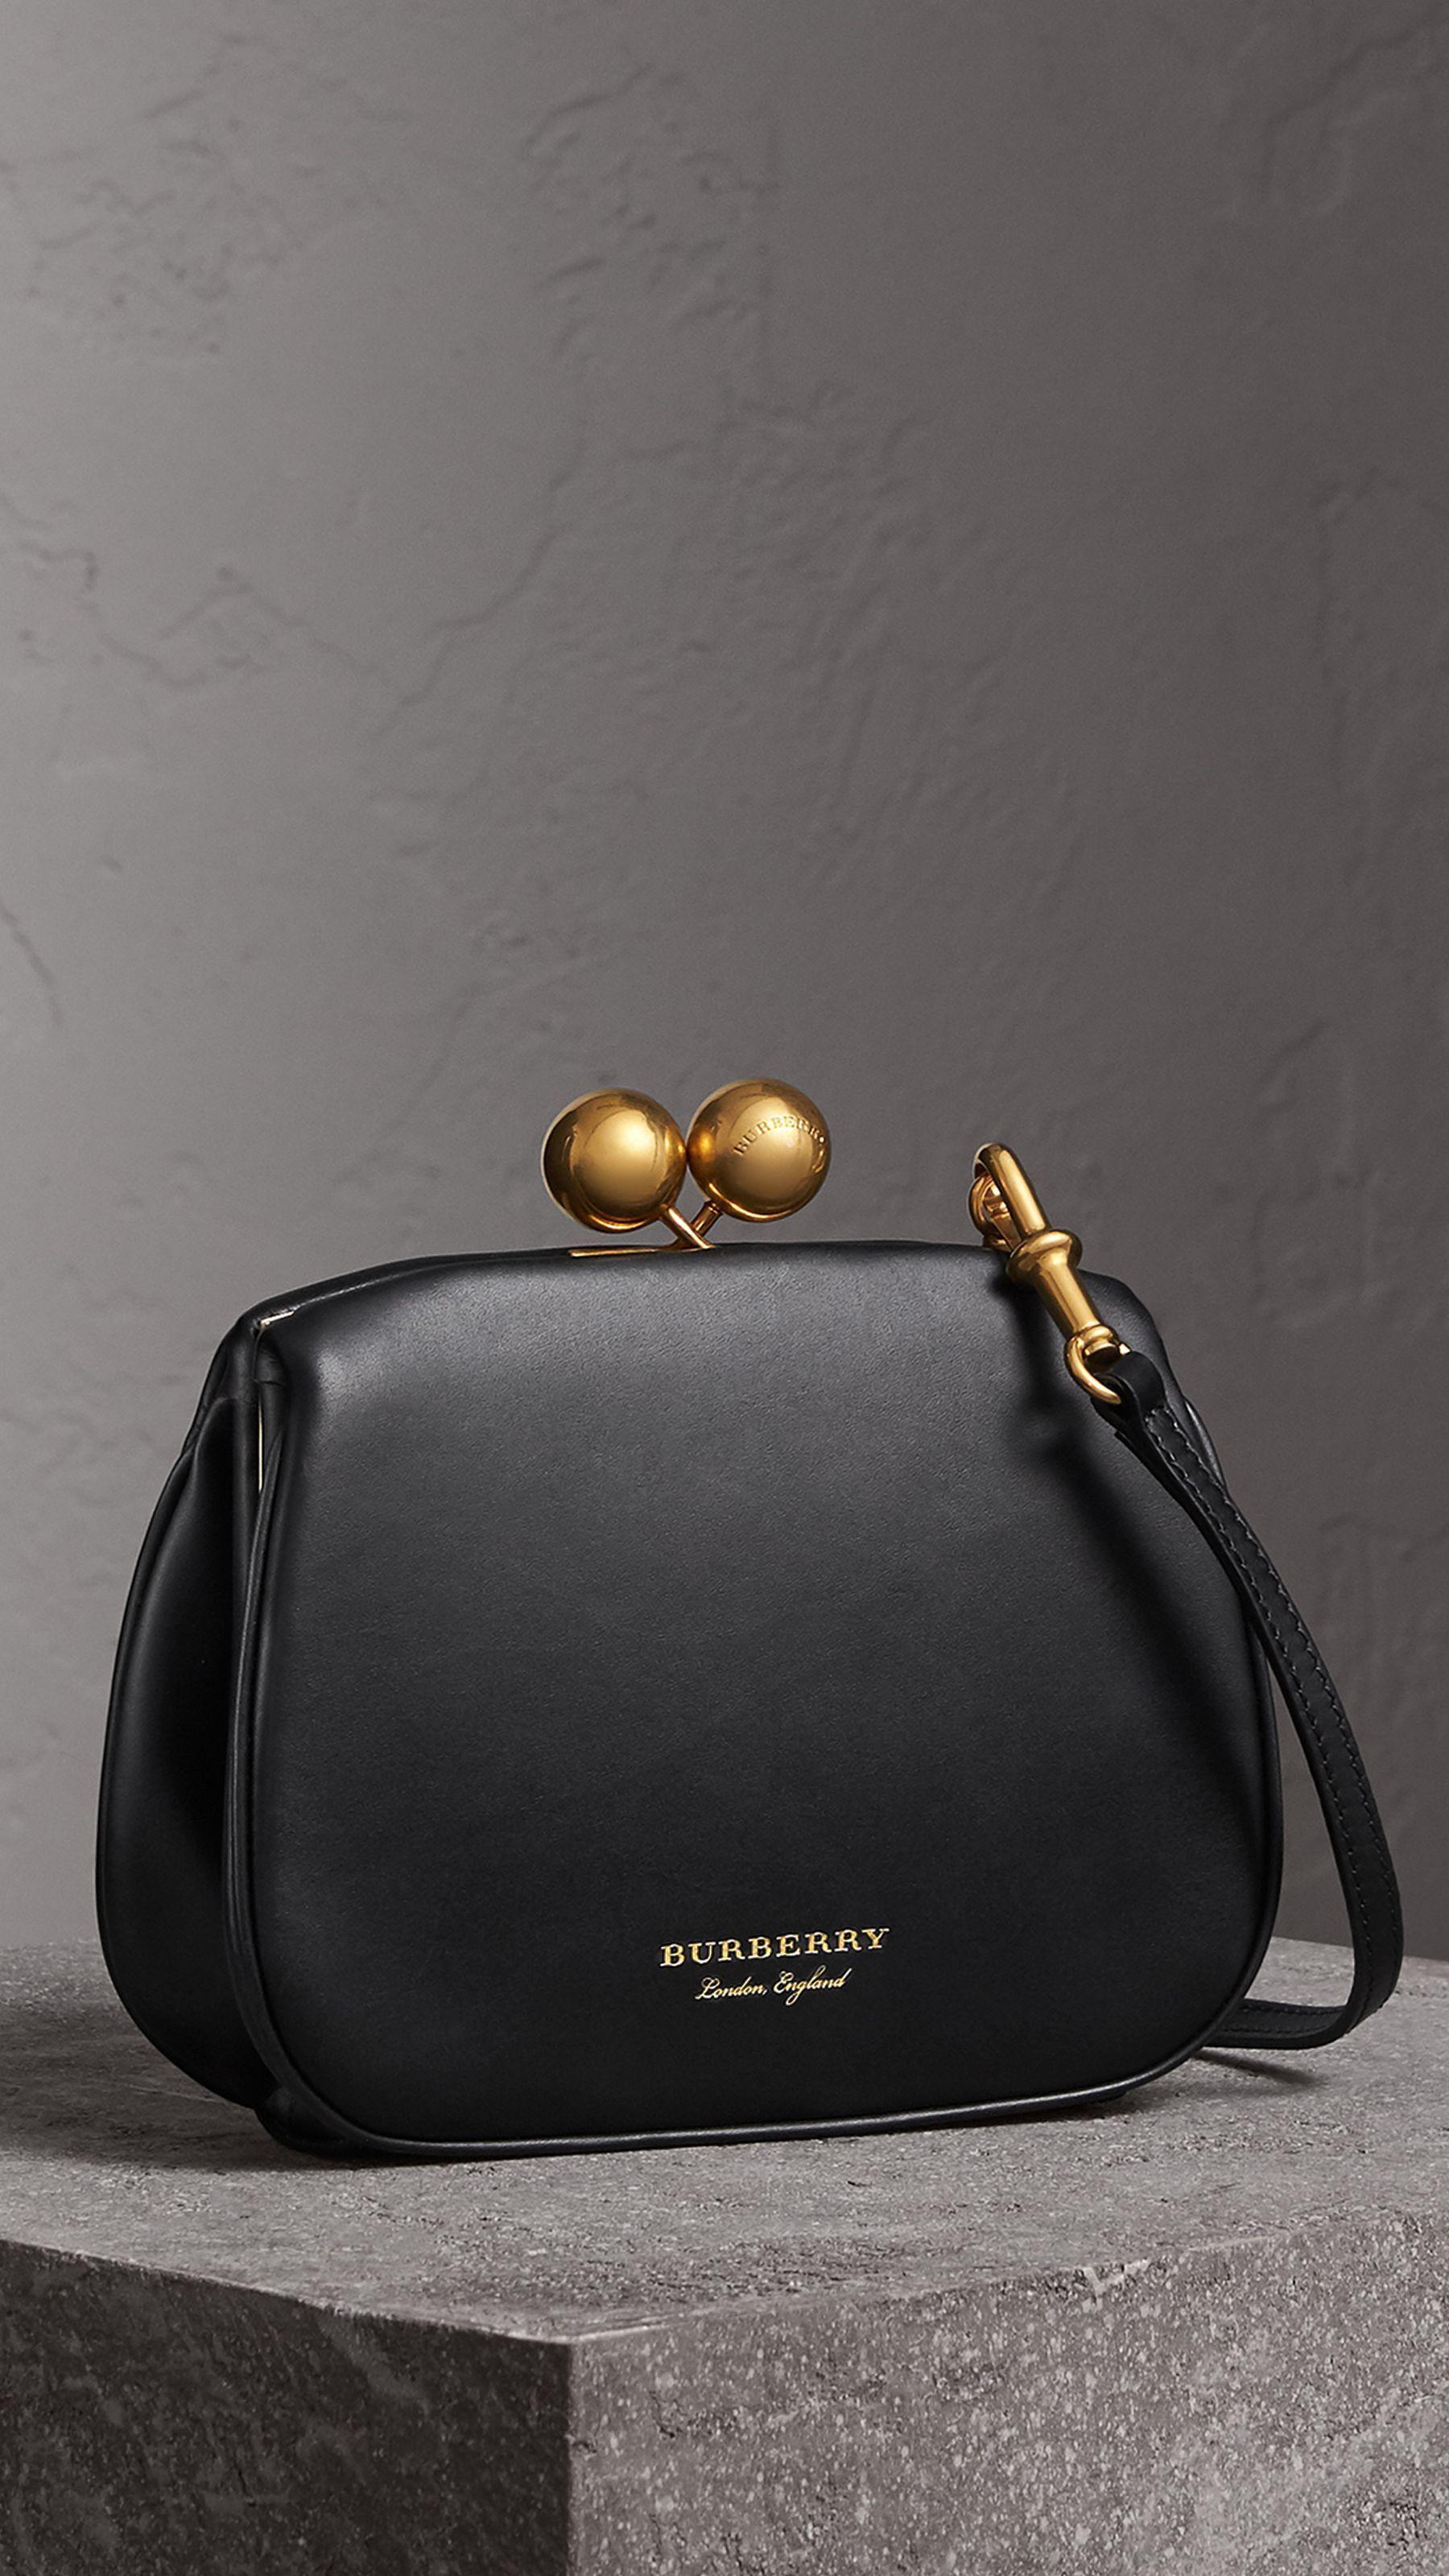 7008e85f96b4 Small Leather Metal Frame Clutch Bag in Black - Women